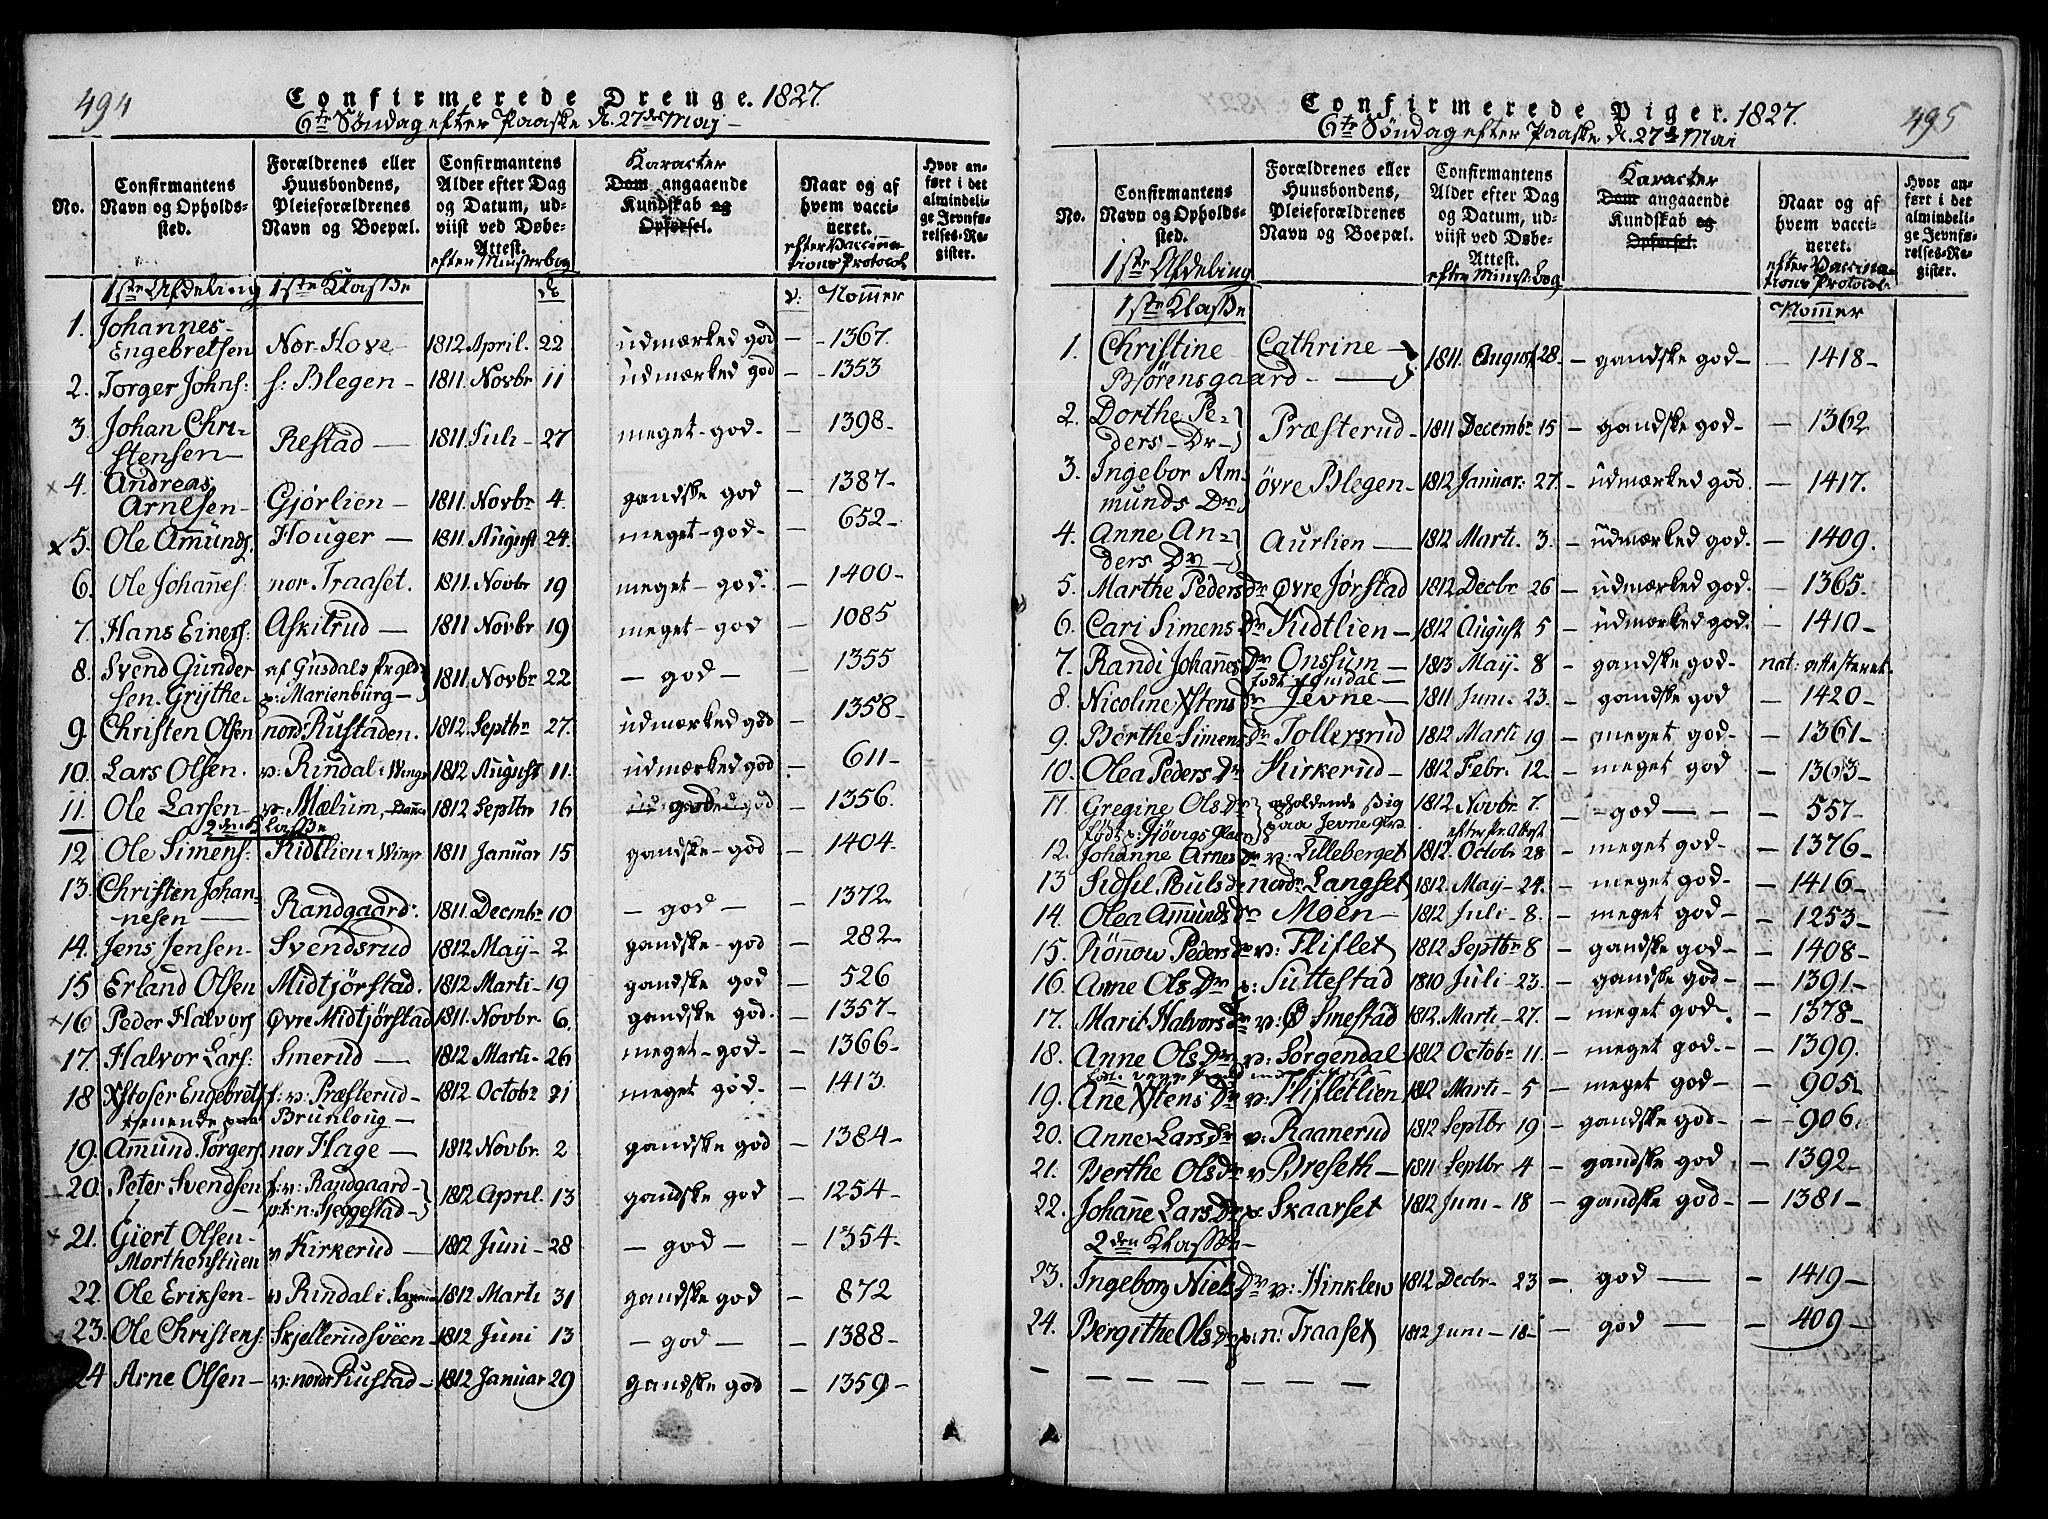 SAH, Fåberg prestekontor, Ministerialbok nr. 3, 1818-1833, s. 494-495